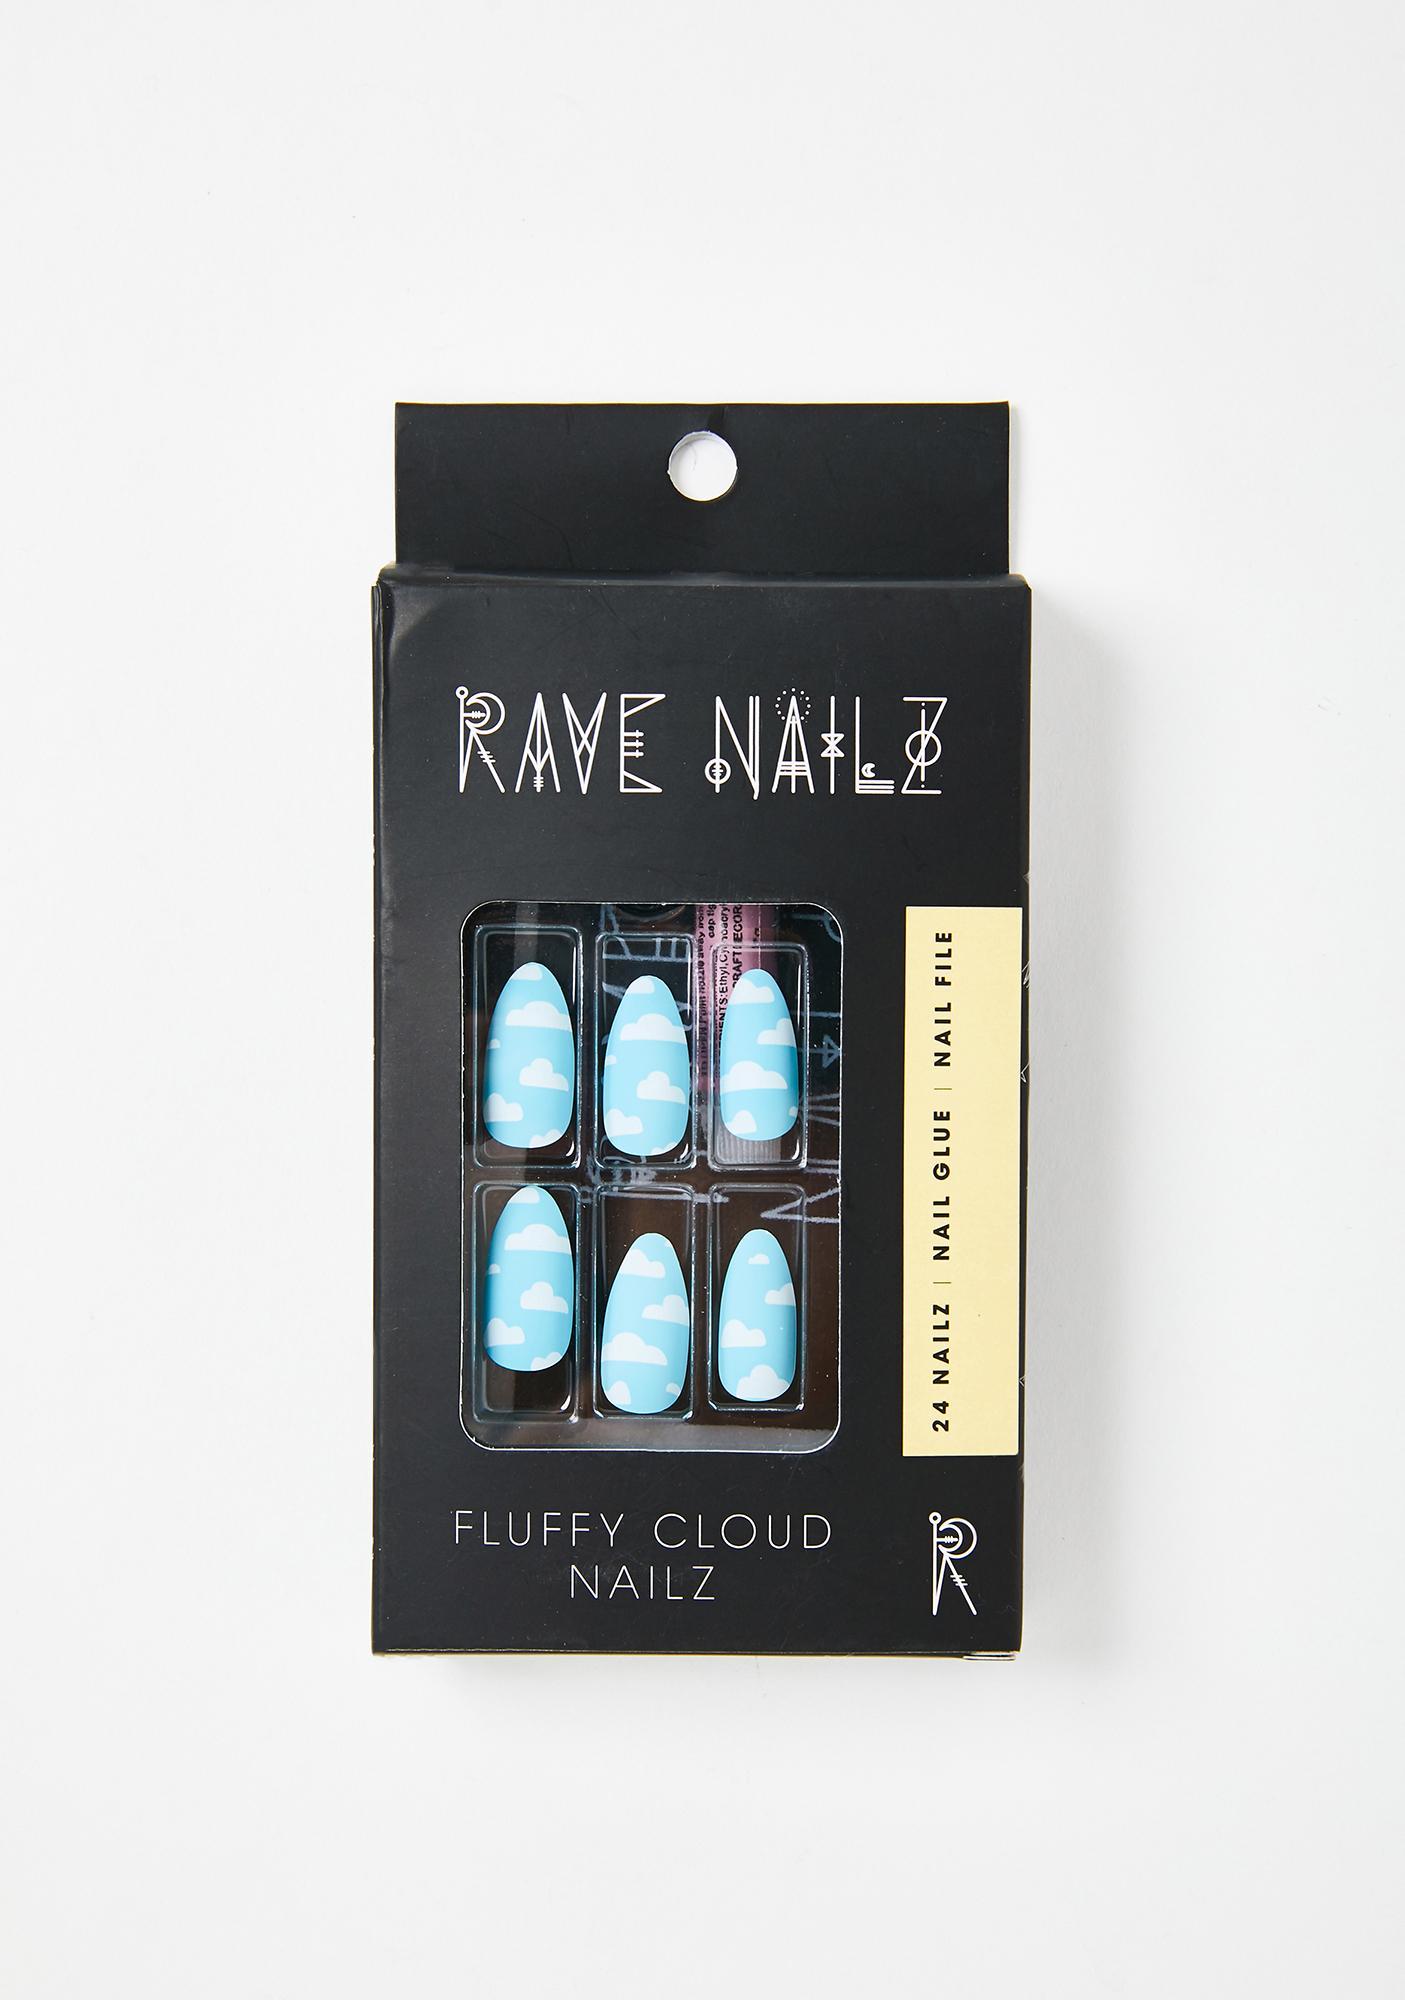 Rave Nailz Fluffy Cloud Acrylic Nails